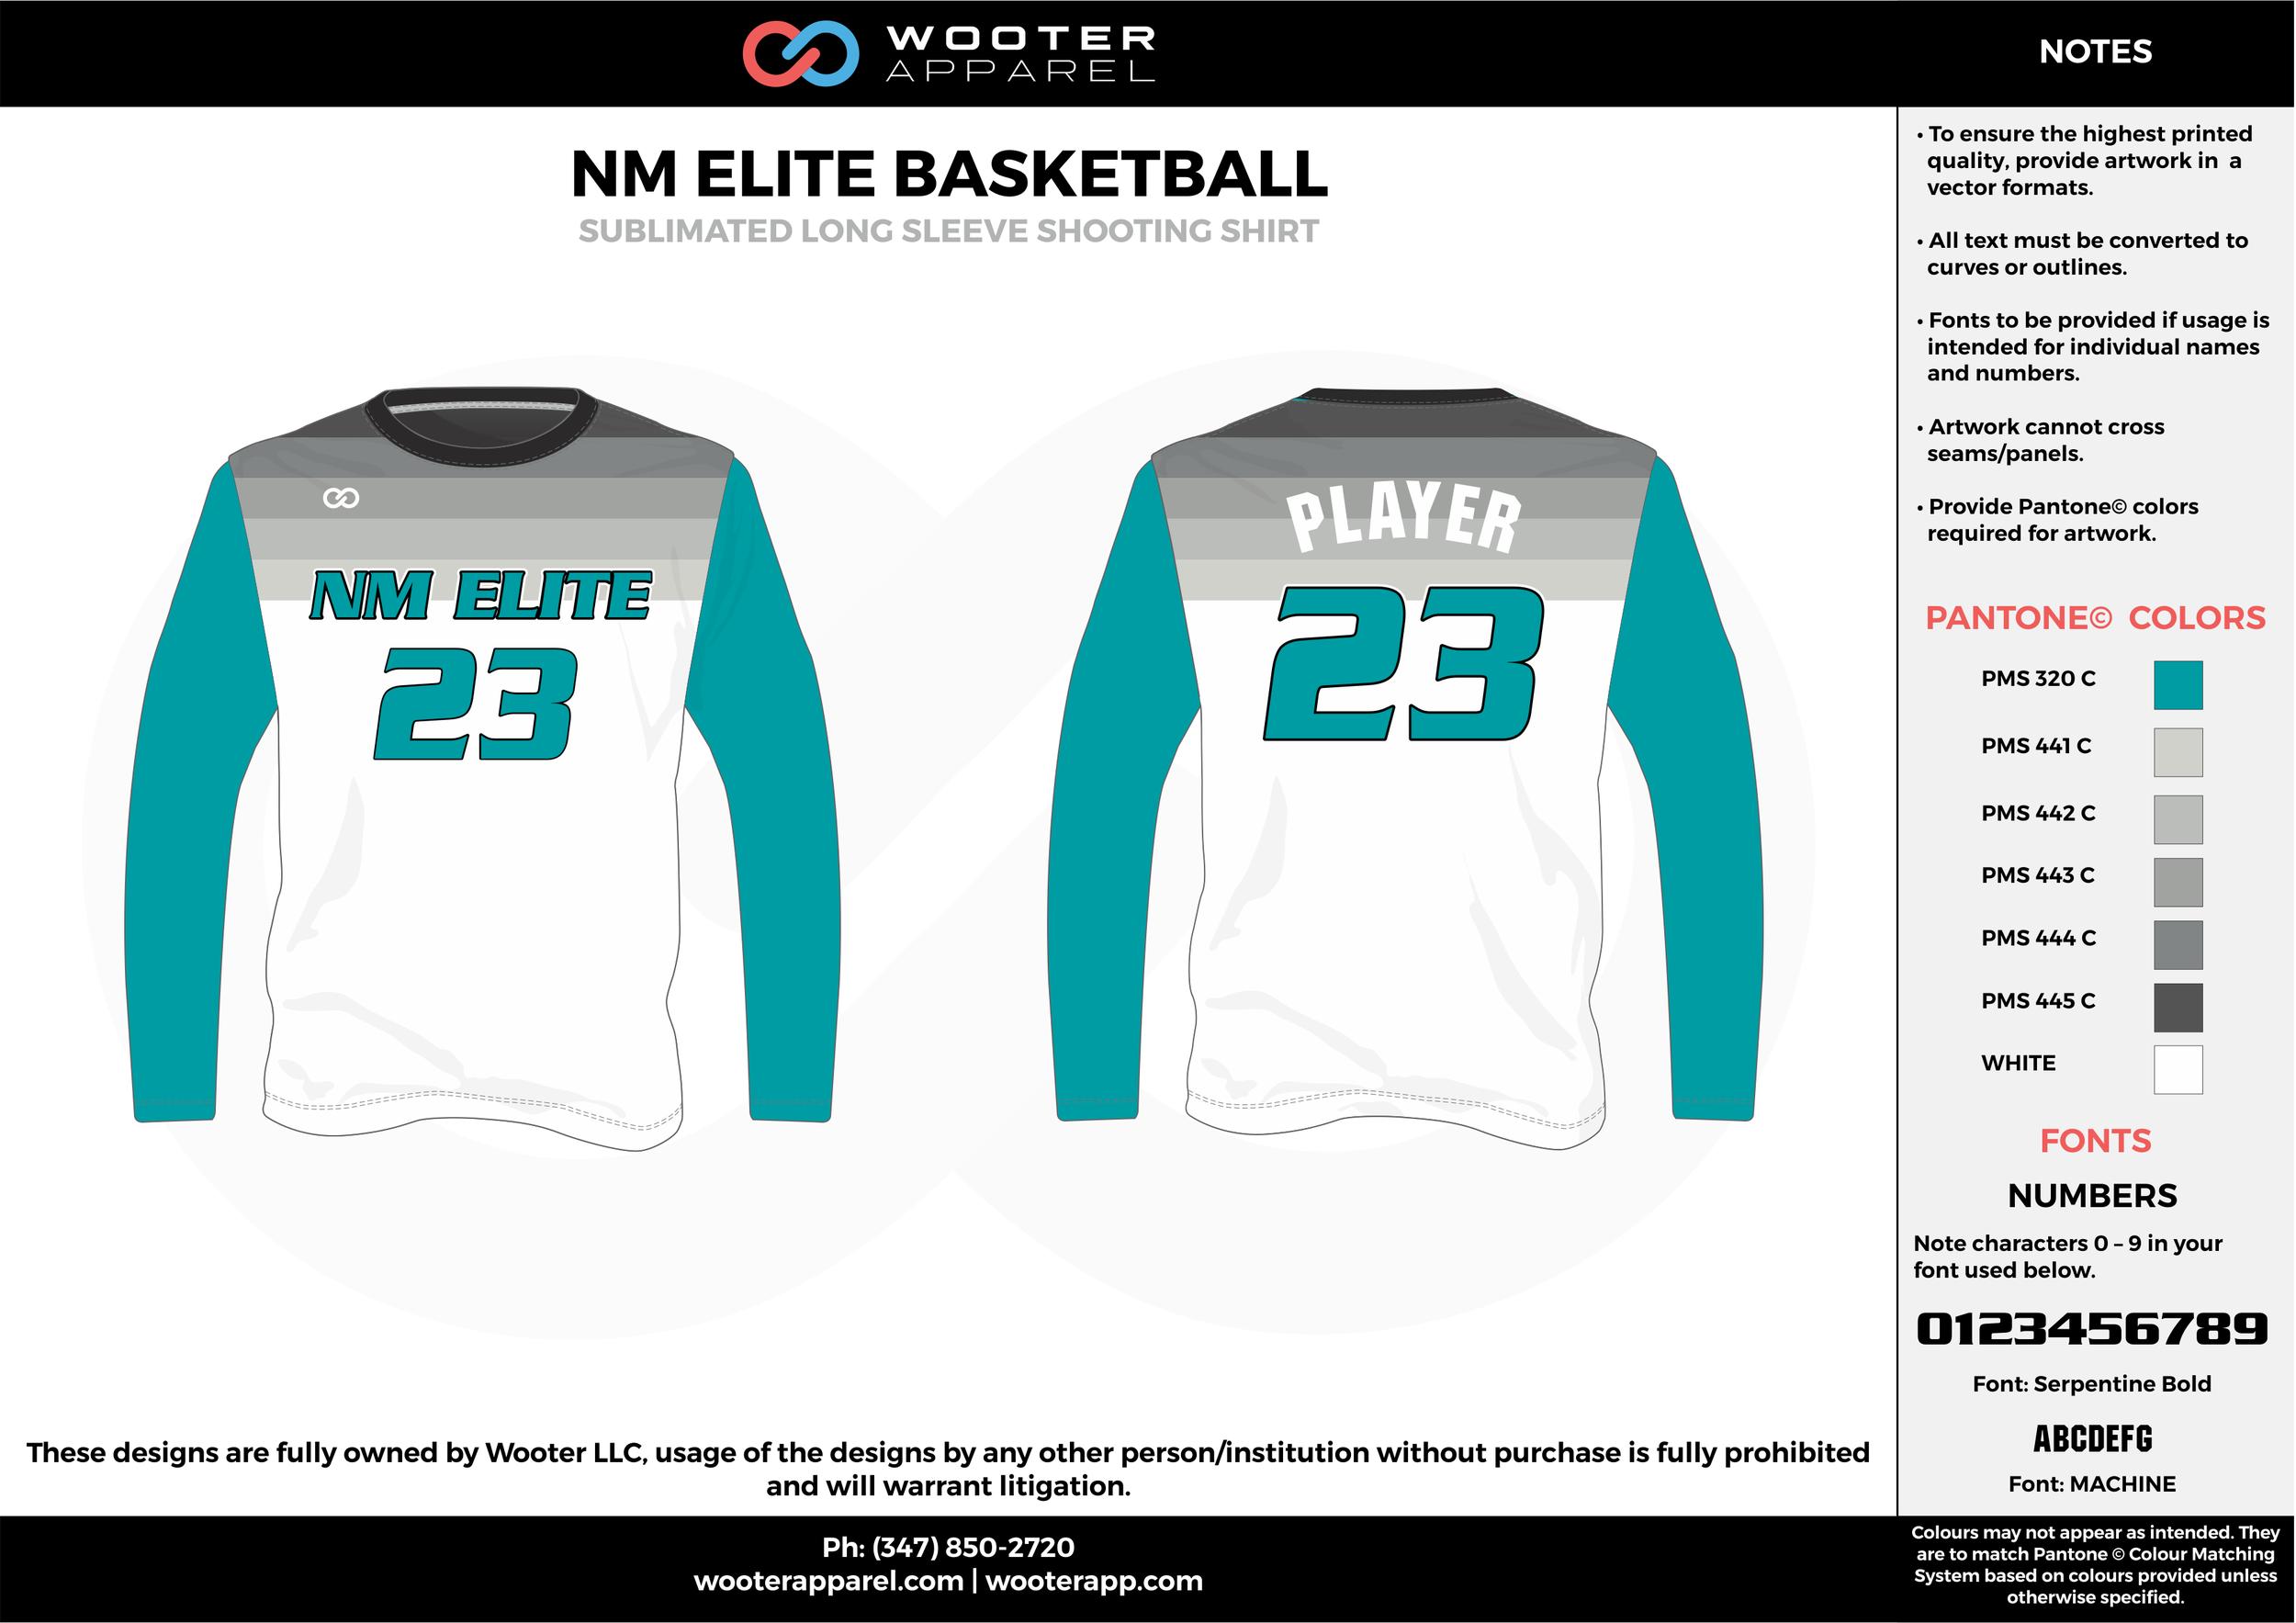 NM ELITE BASKETBALL water blue gray white Basketball Long Sleeve Shooting Shirt